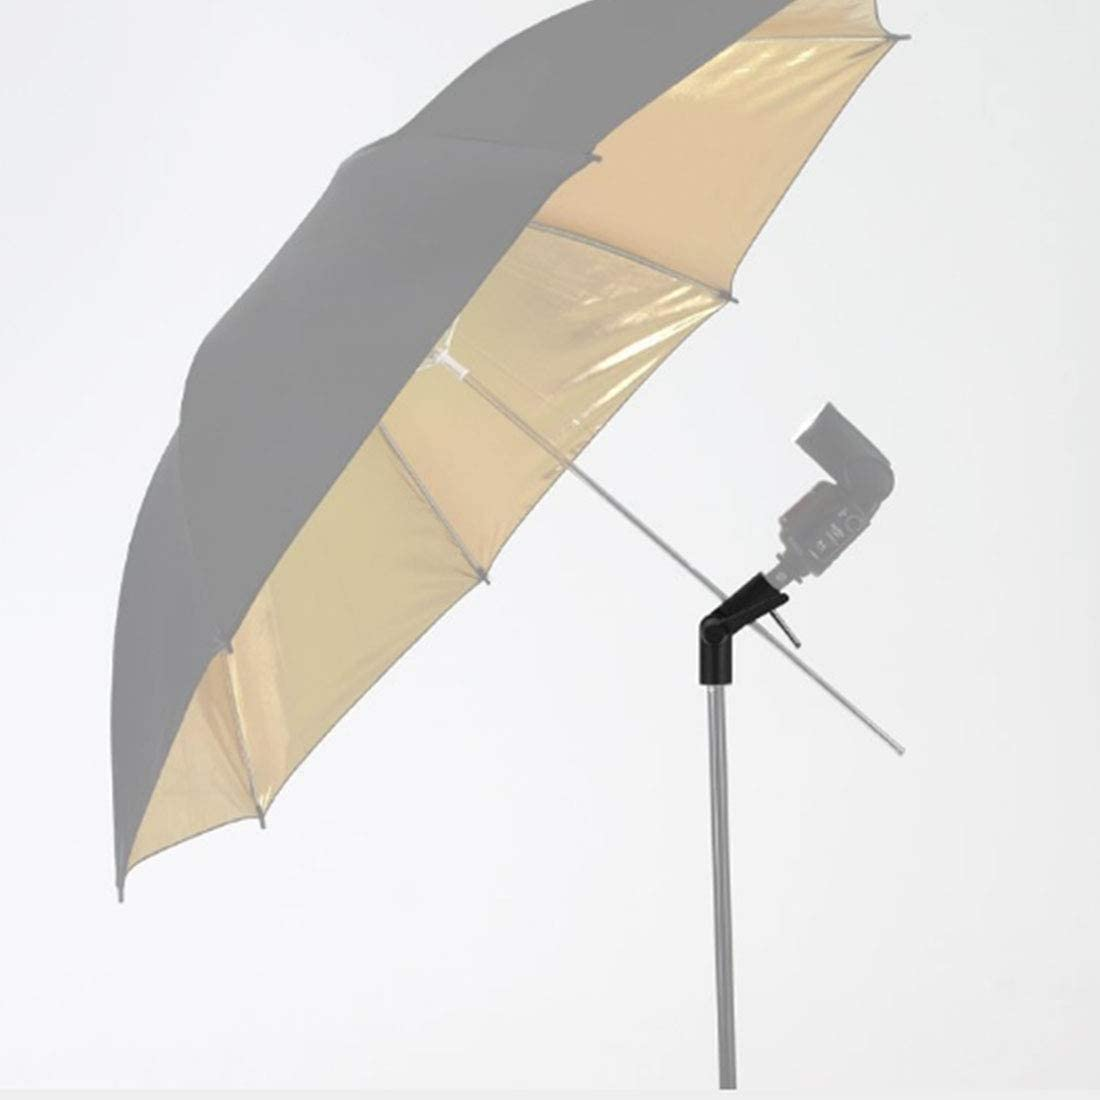 Max Load Rotations YHM H Type Multifunctional Flash Light Stand Umbrella Bracket 3kg